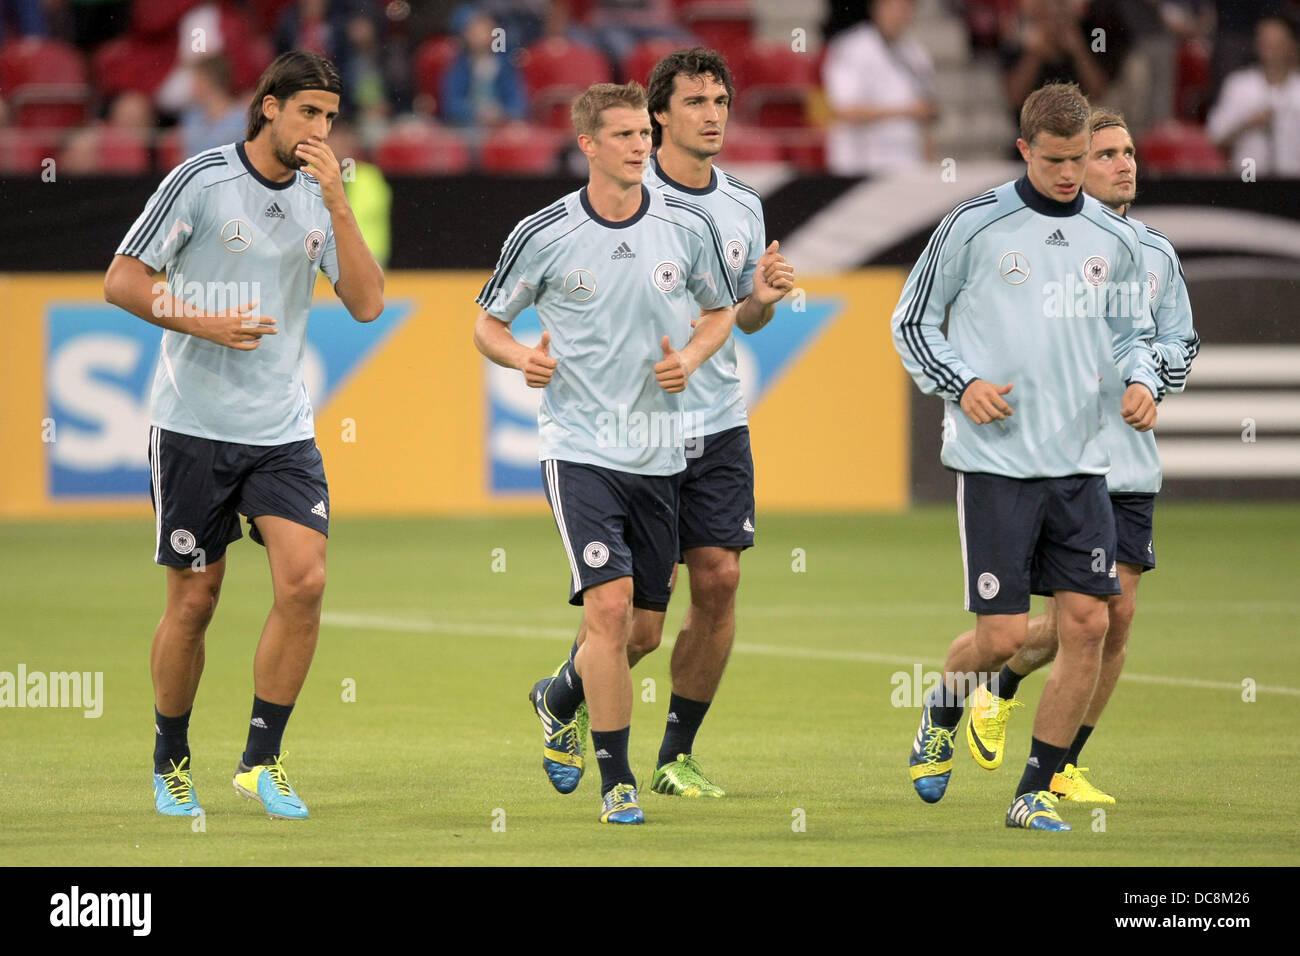 German Team Sami Khedira Stock Photos   German Team Sami Khedira ... 76897bd68e31b